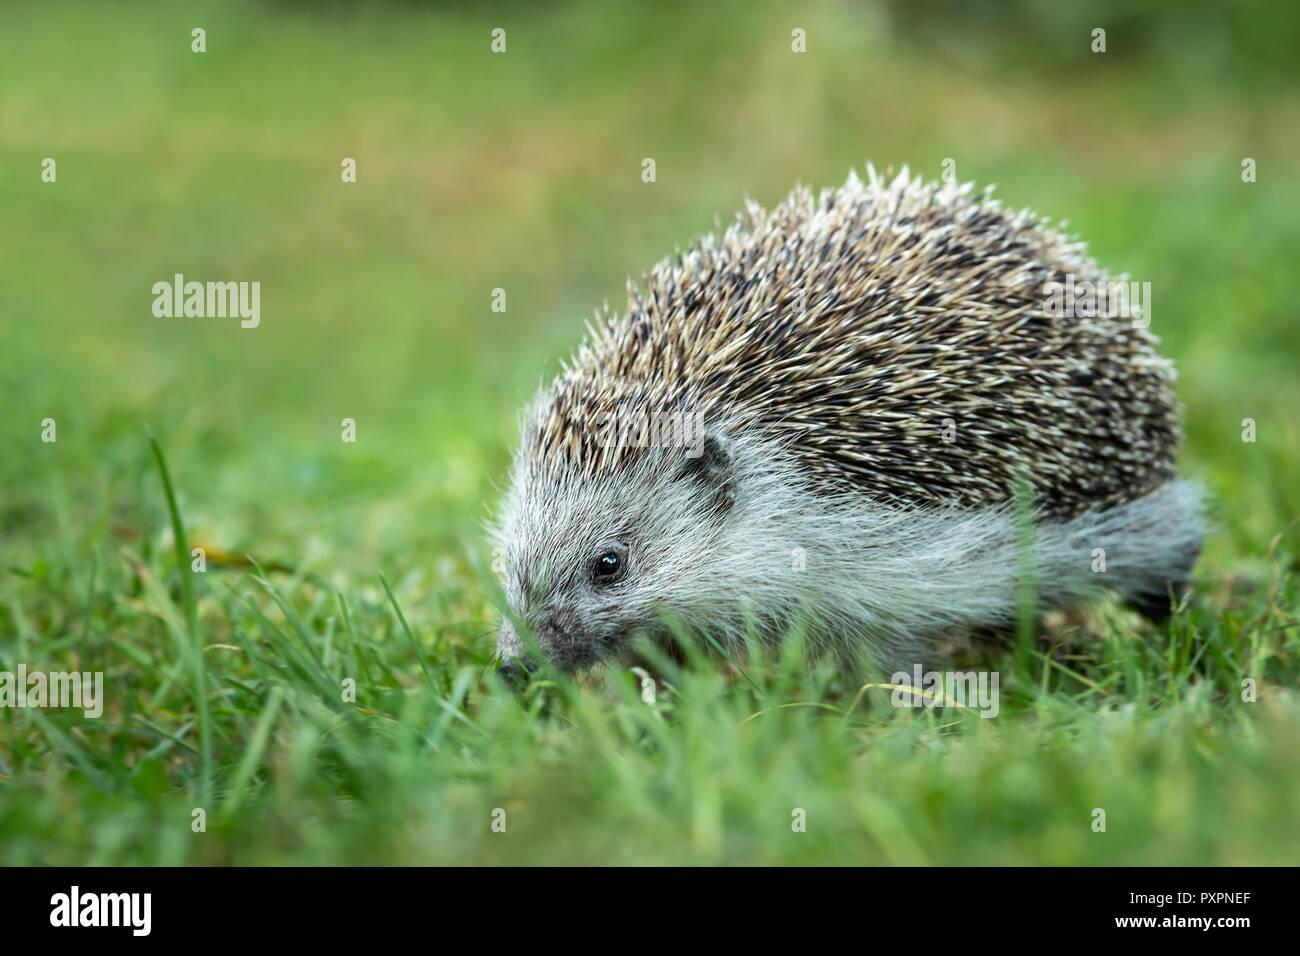 Portrait of a hedgehog walking in a green meadow in autumn - Stock Image